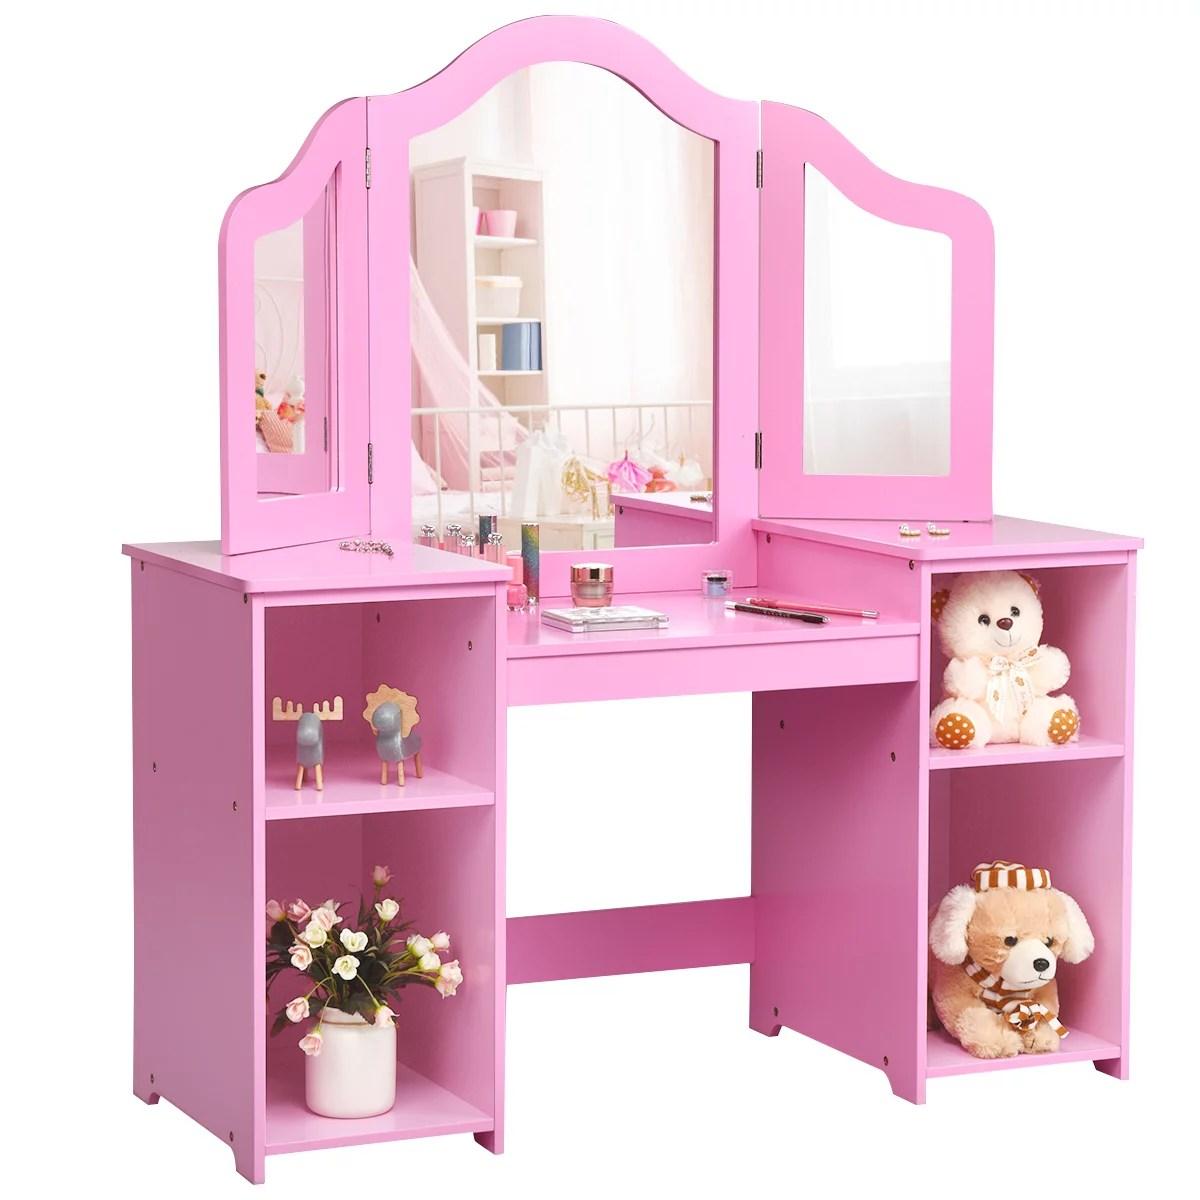 costway vanity table set makeup dressing kids girls study table tri folding mirror whitepink